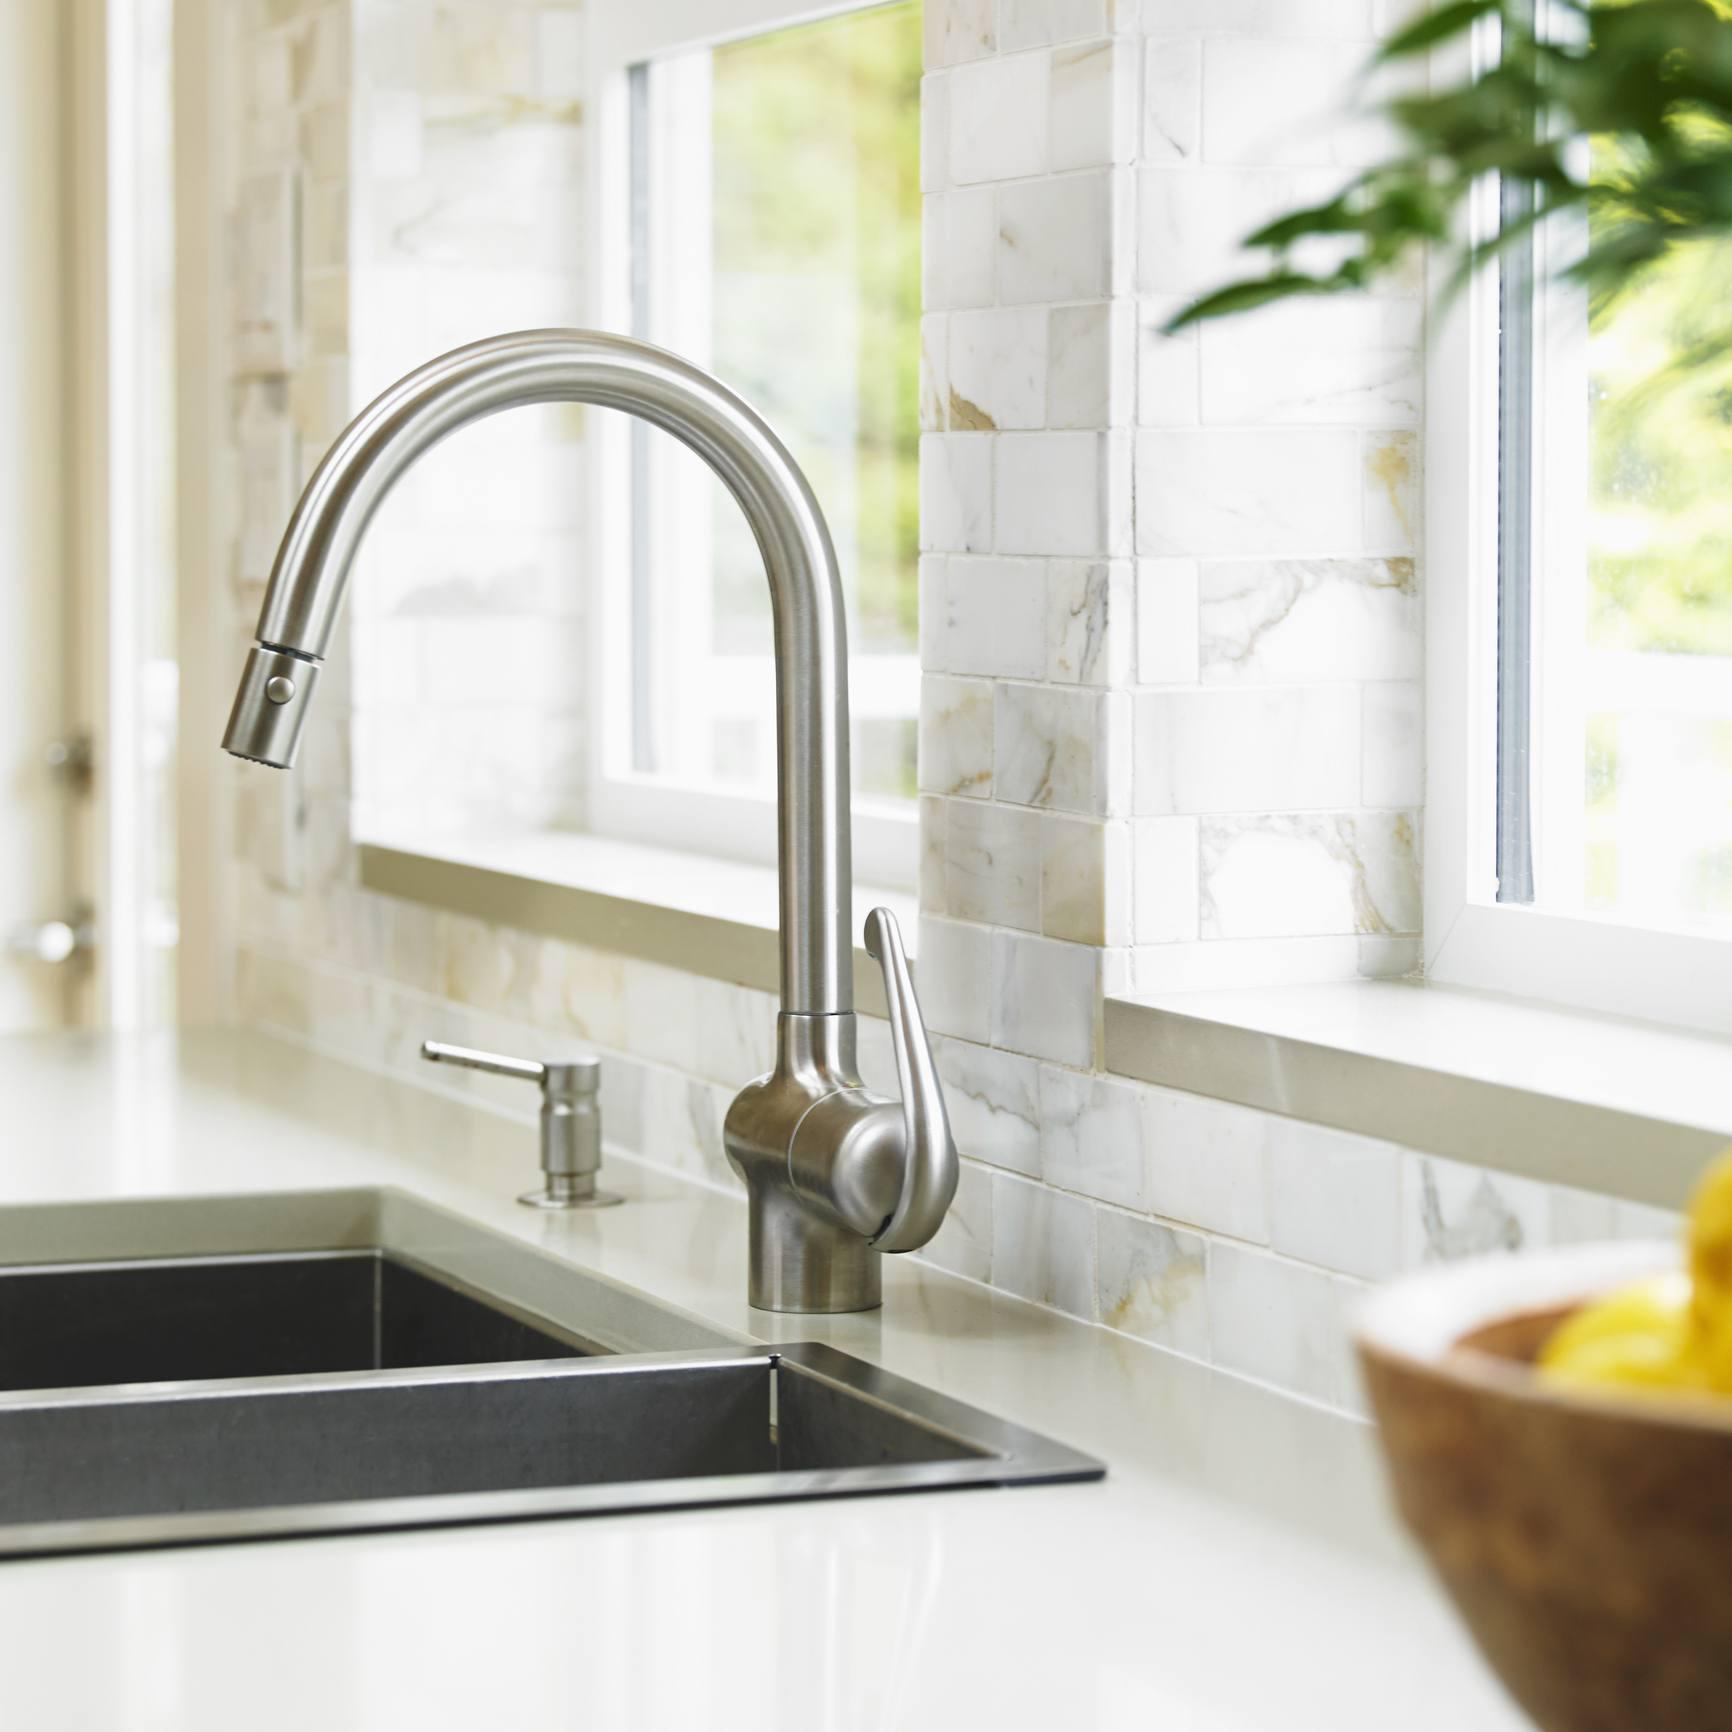 Magnificent Kitchen Sink Faucet Wrench Pictures - Best Kitchen Ideas ...